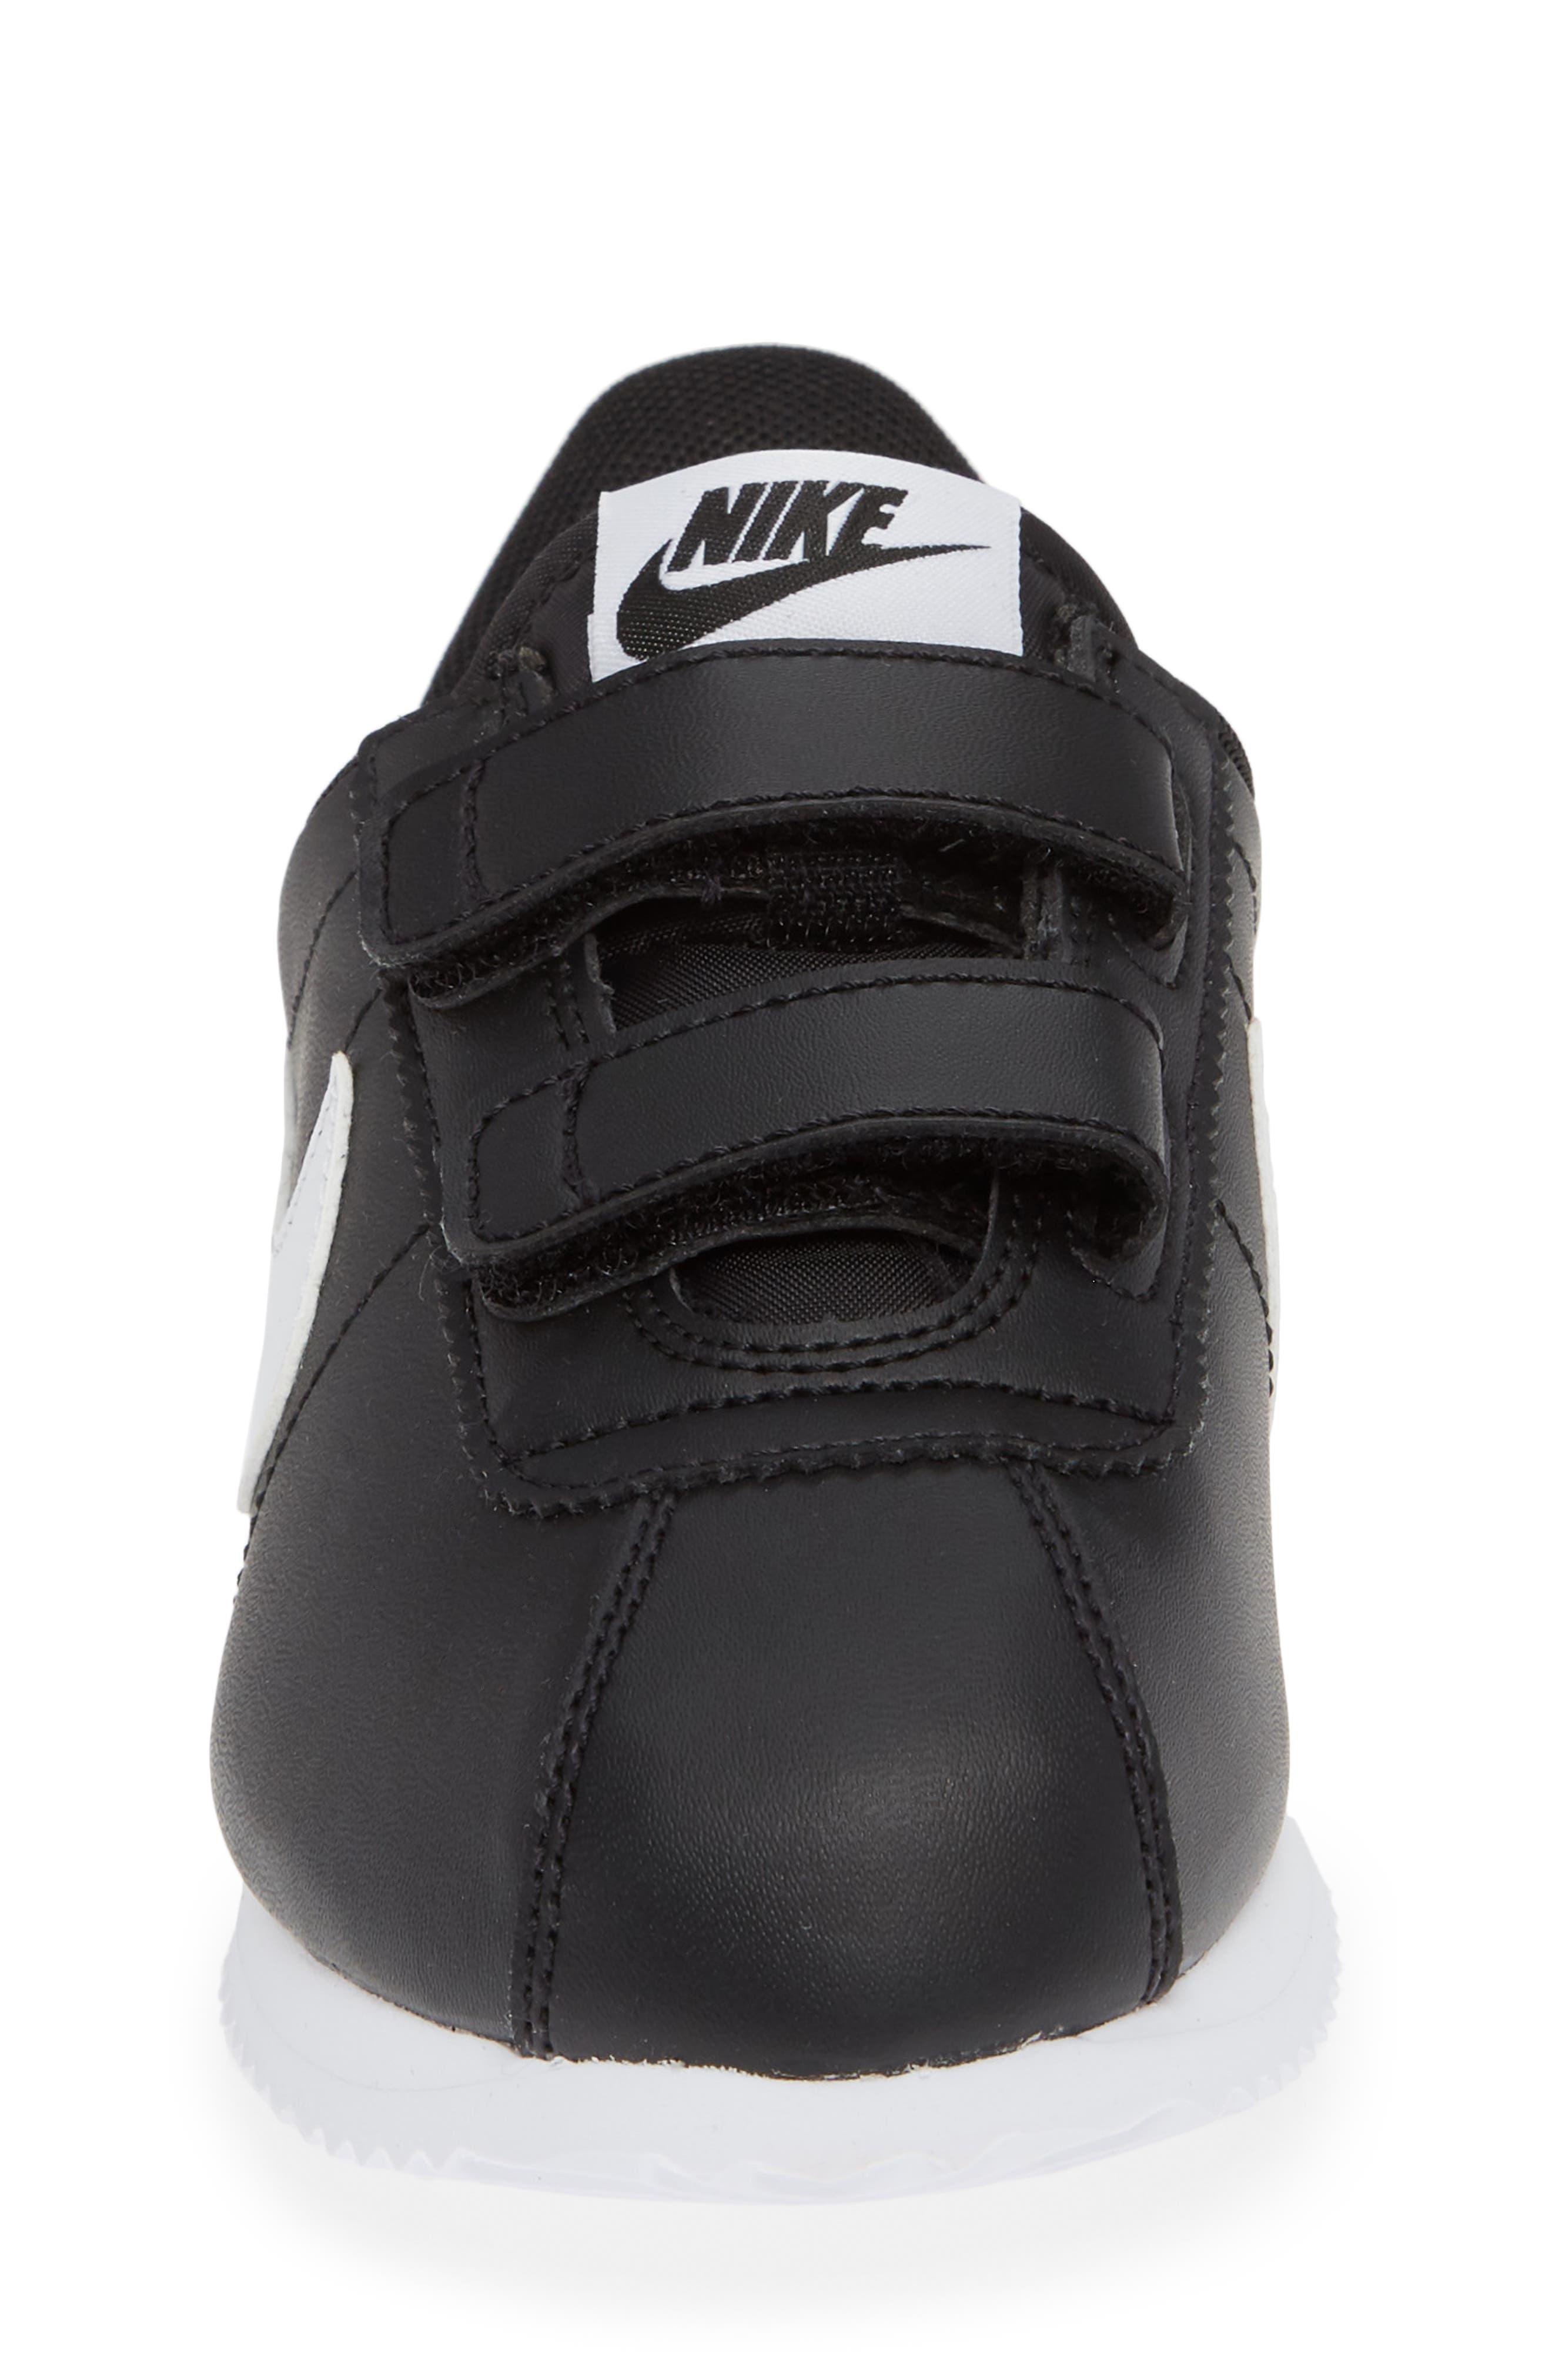 Cortez Basic SL Sneaker,                             Alternate thumbnail 5, color,                             Black/ White